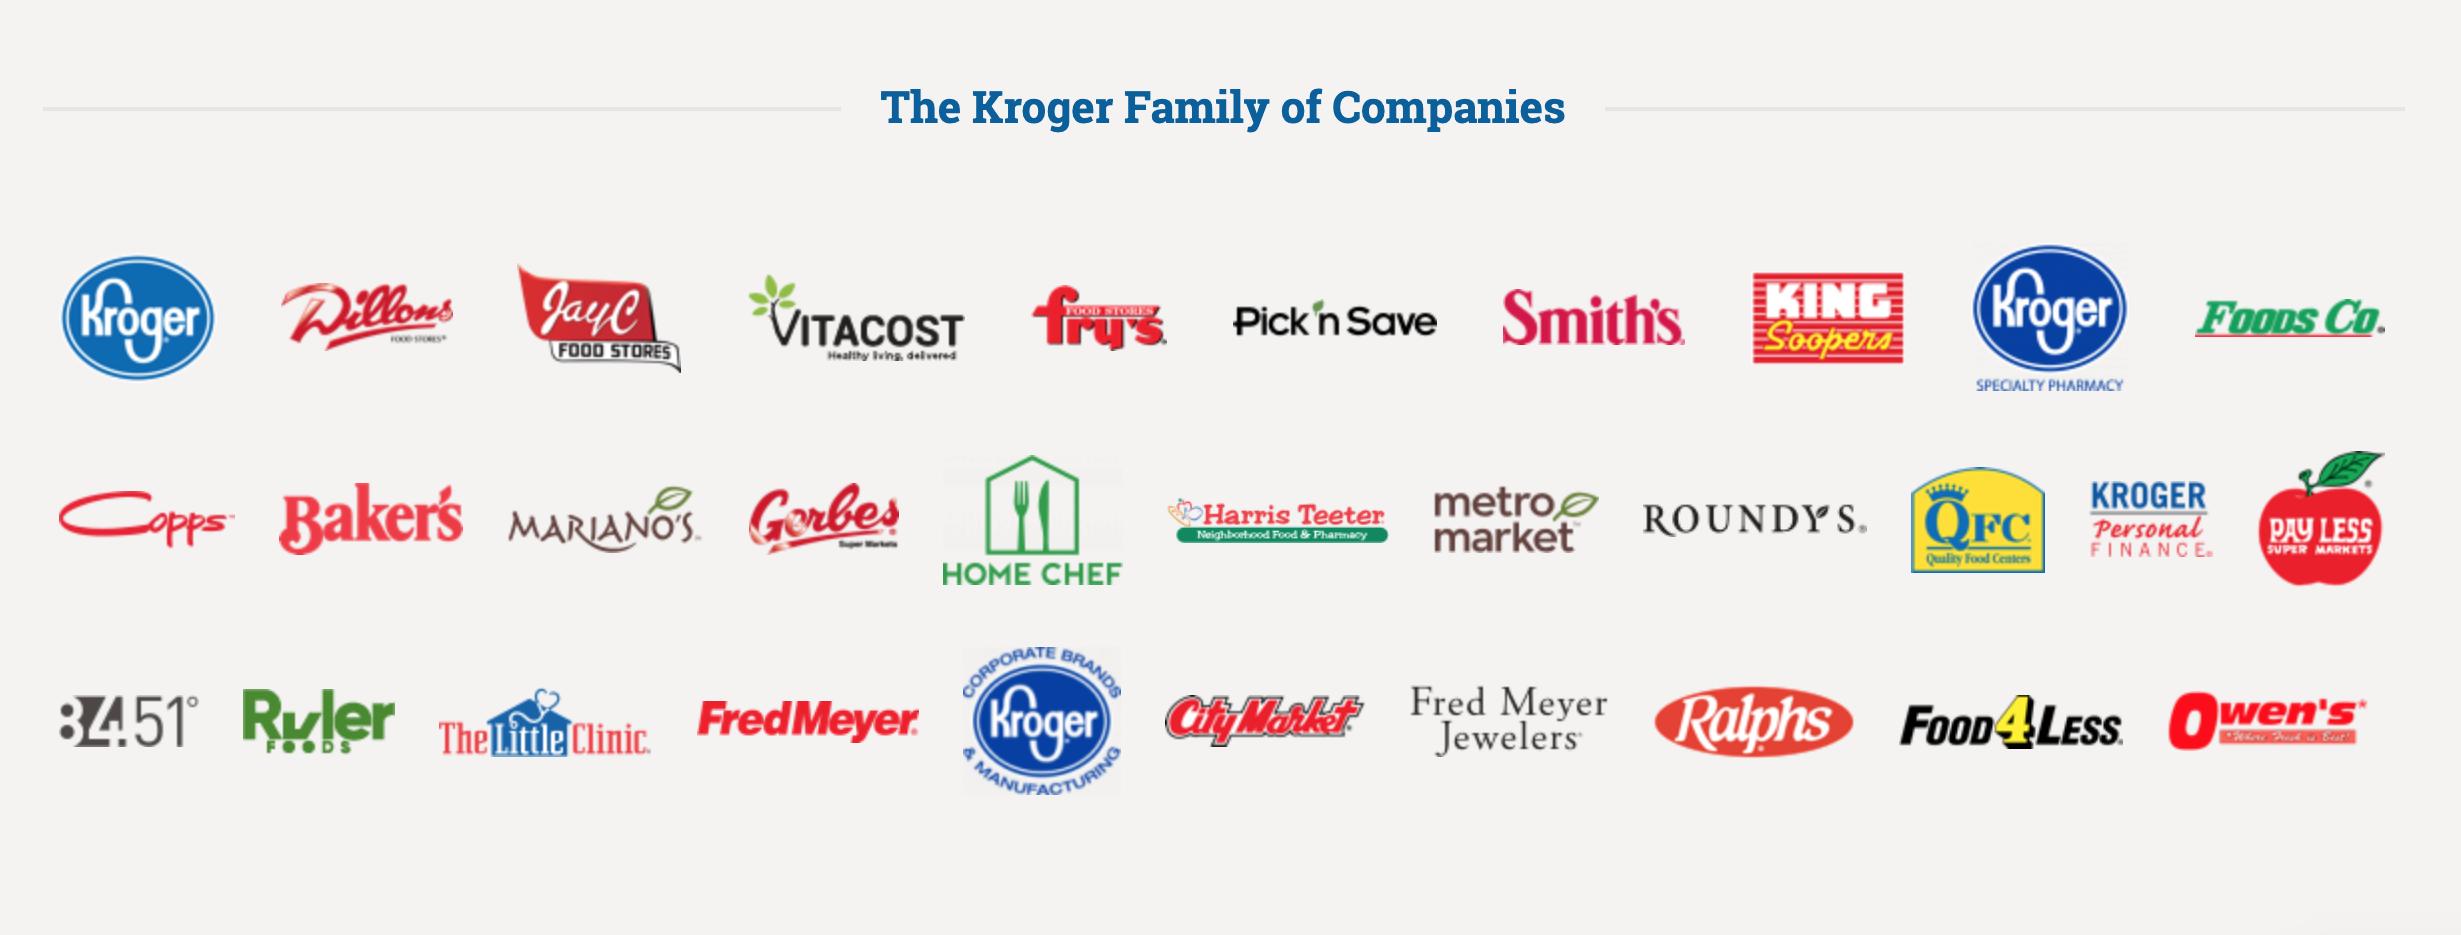 Kroger Family of Companies